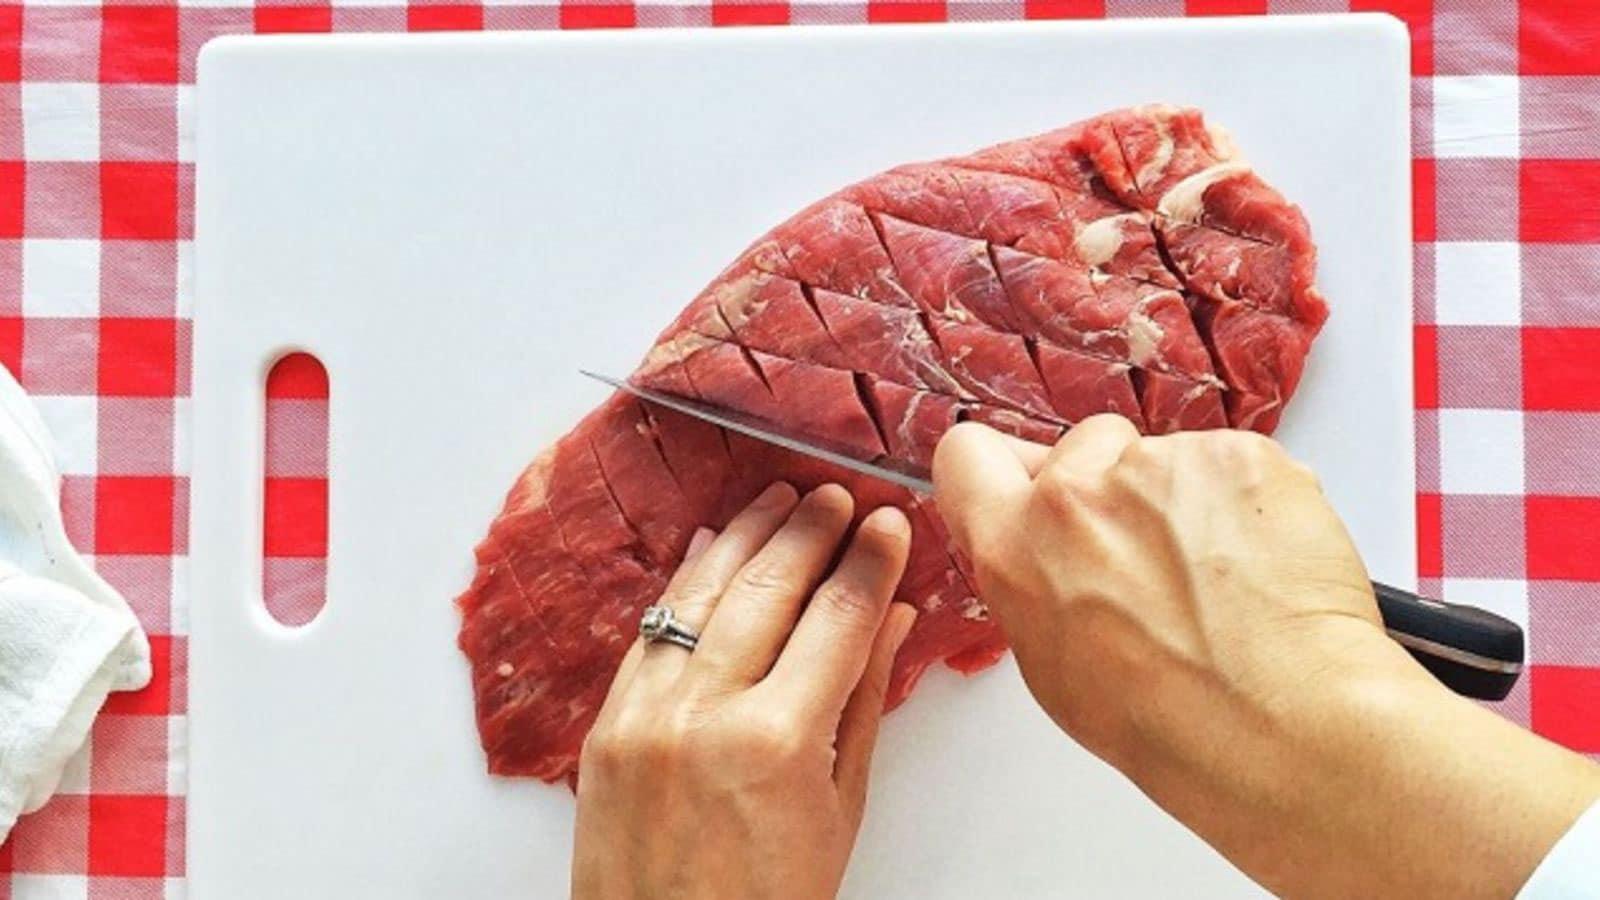 score the meat